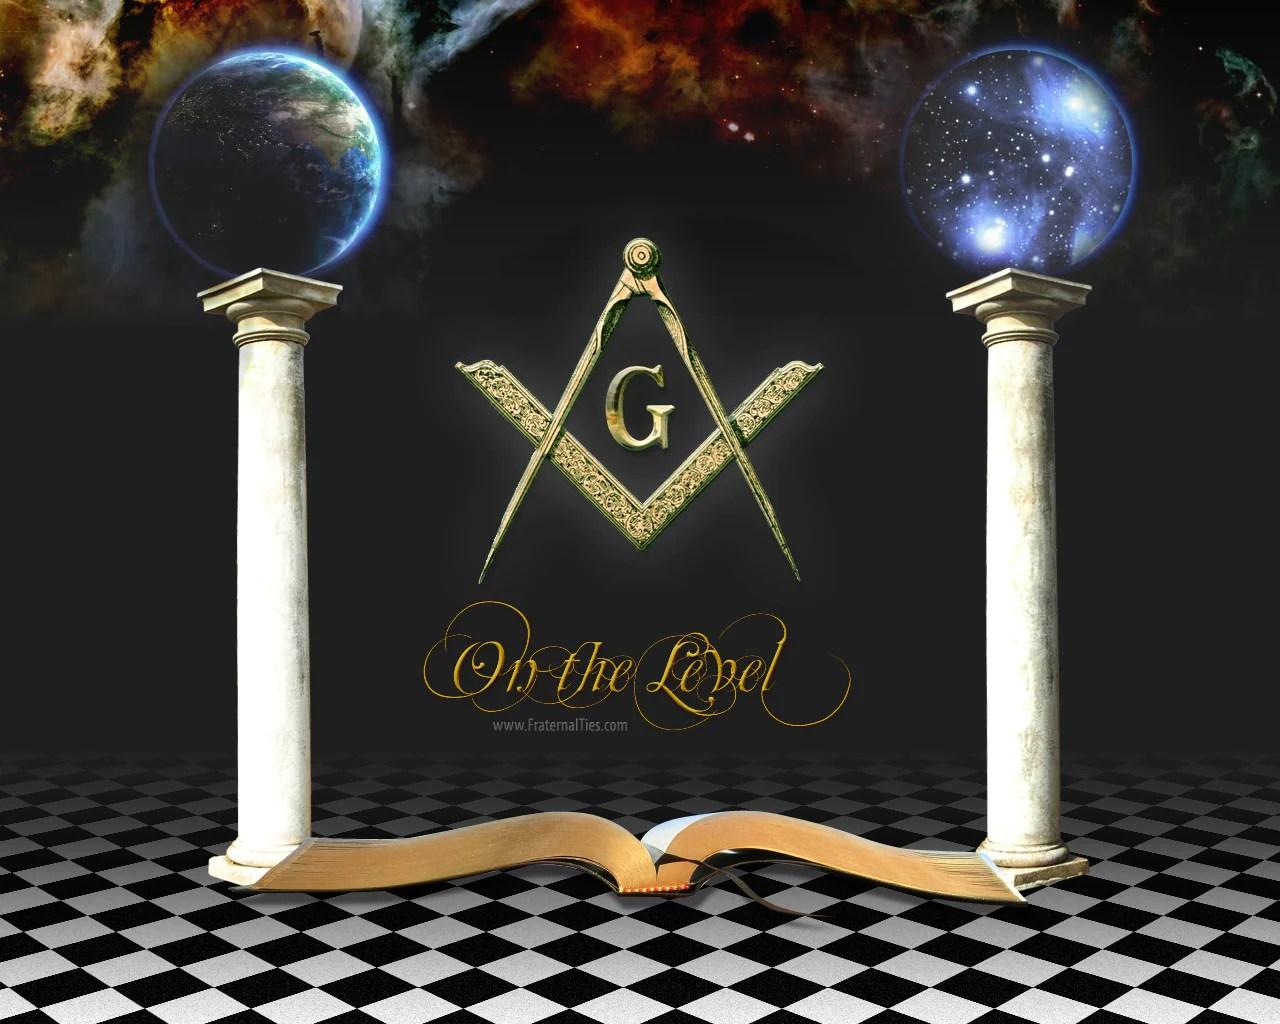 Freemason Iphone Wallpaper Freemason Wallpaper Www Proteckmachinery Com